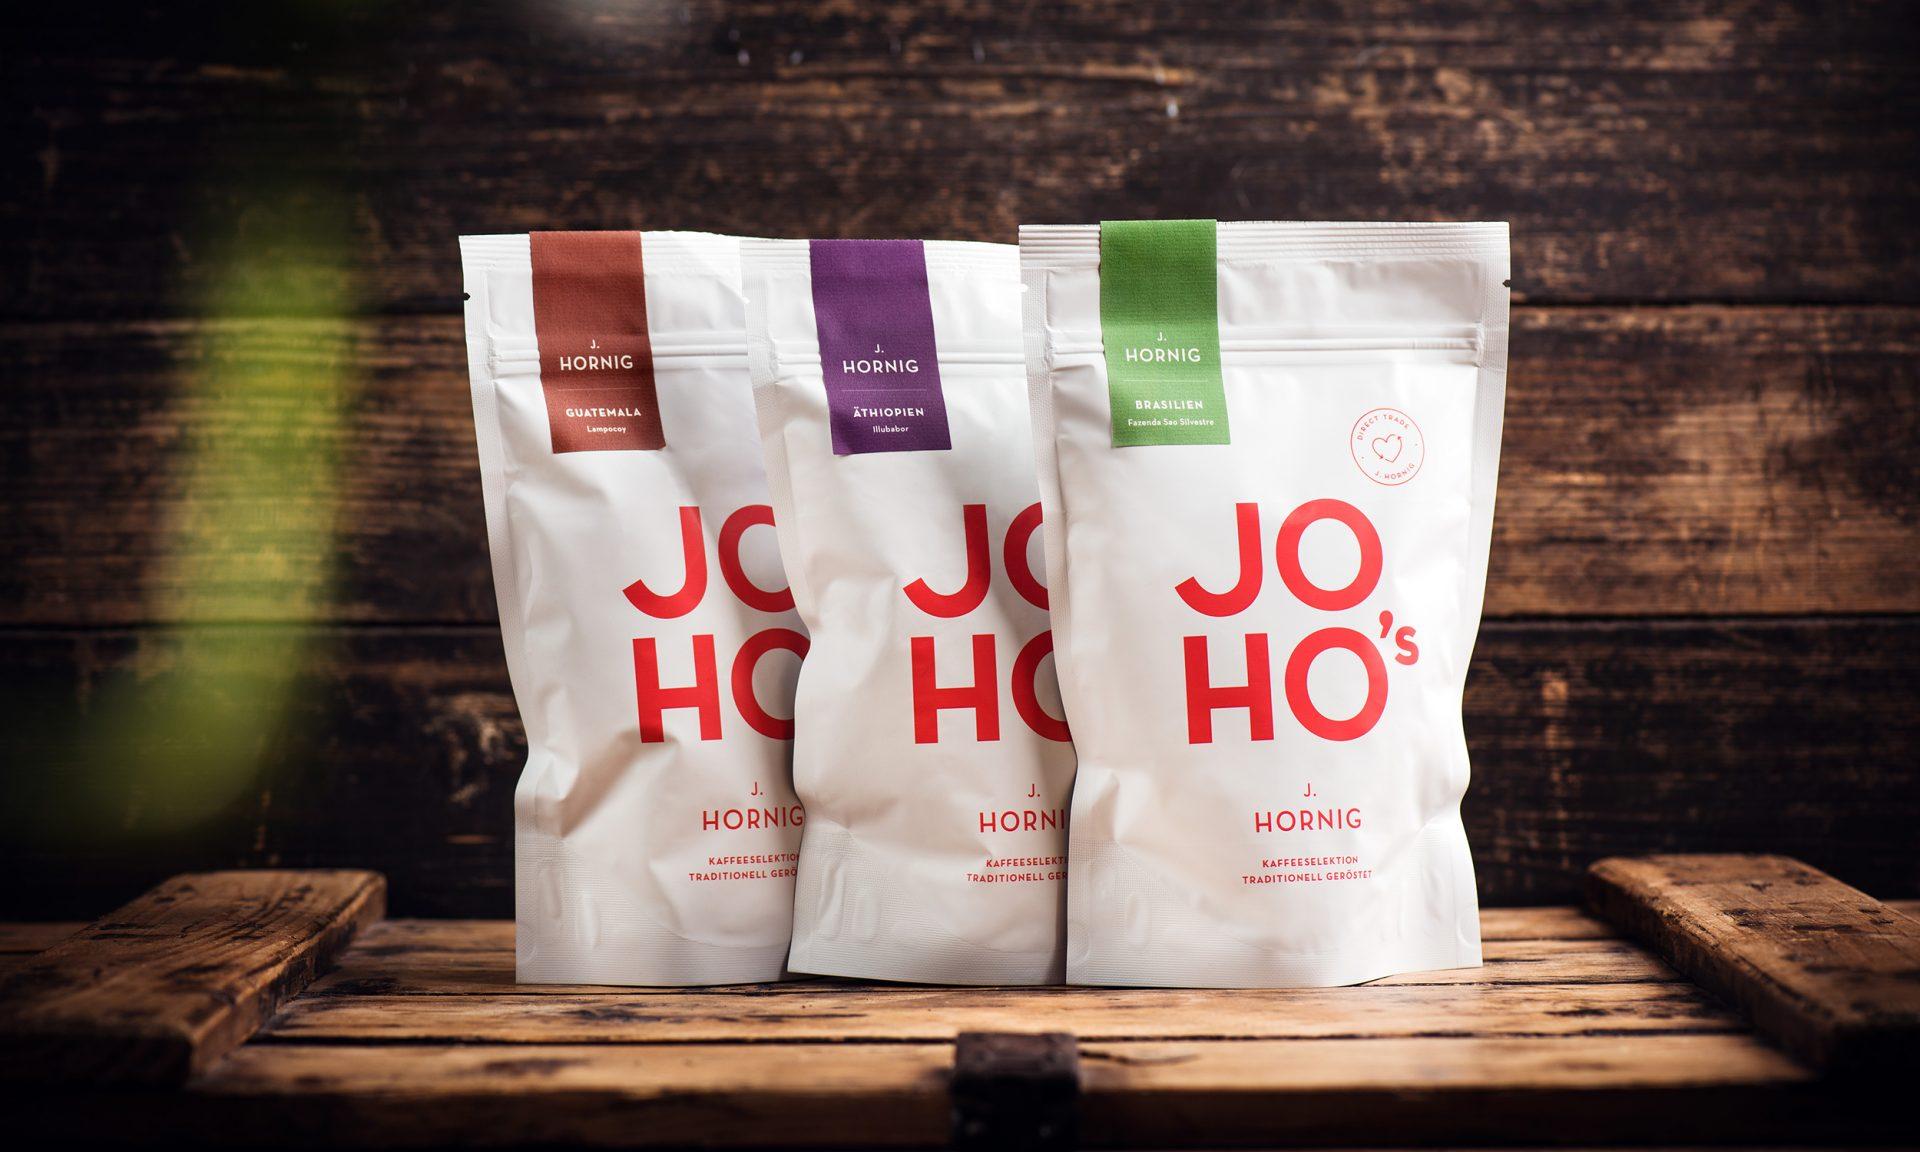 So schmeckt unser JOHO's-Spezialitätenkaffe | J. Hornig